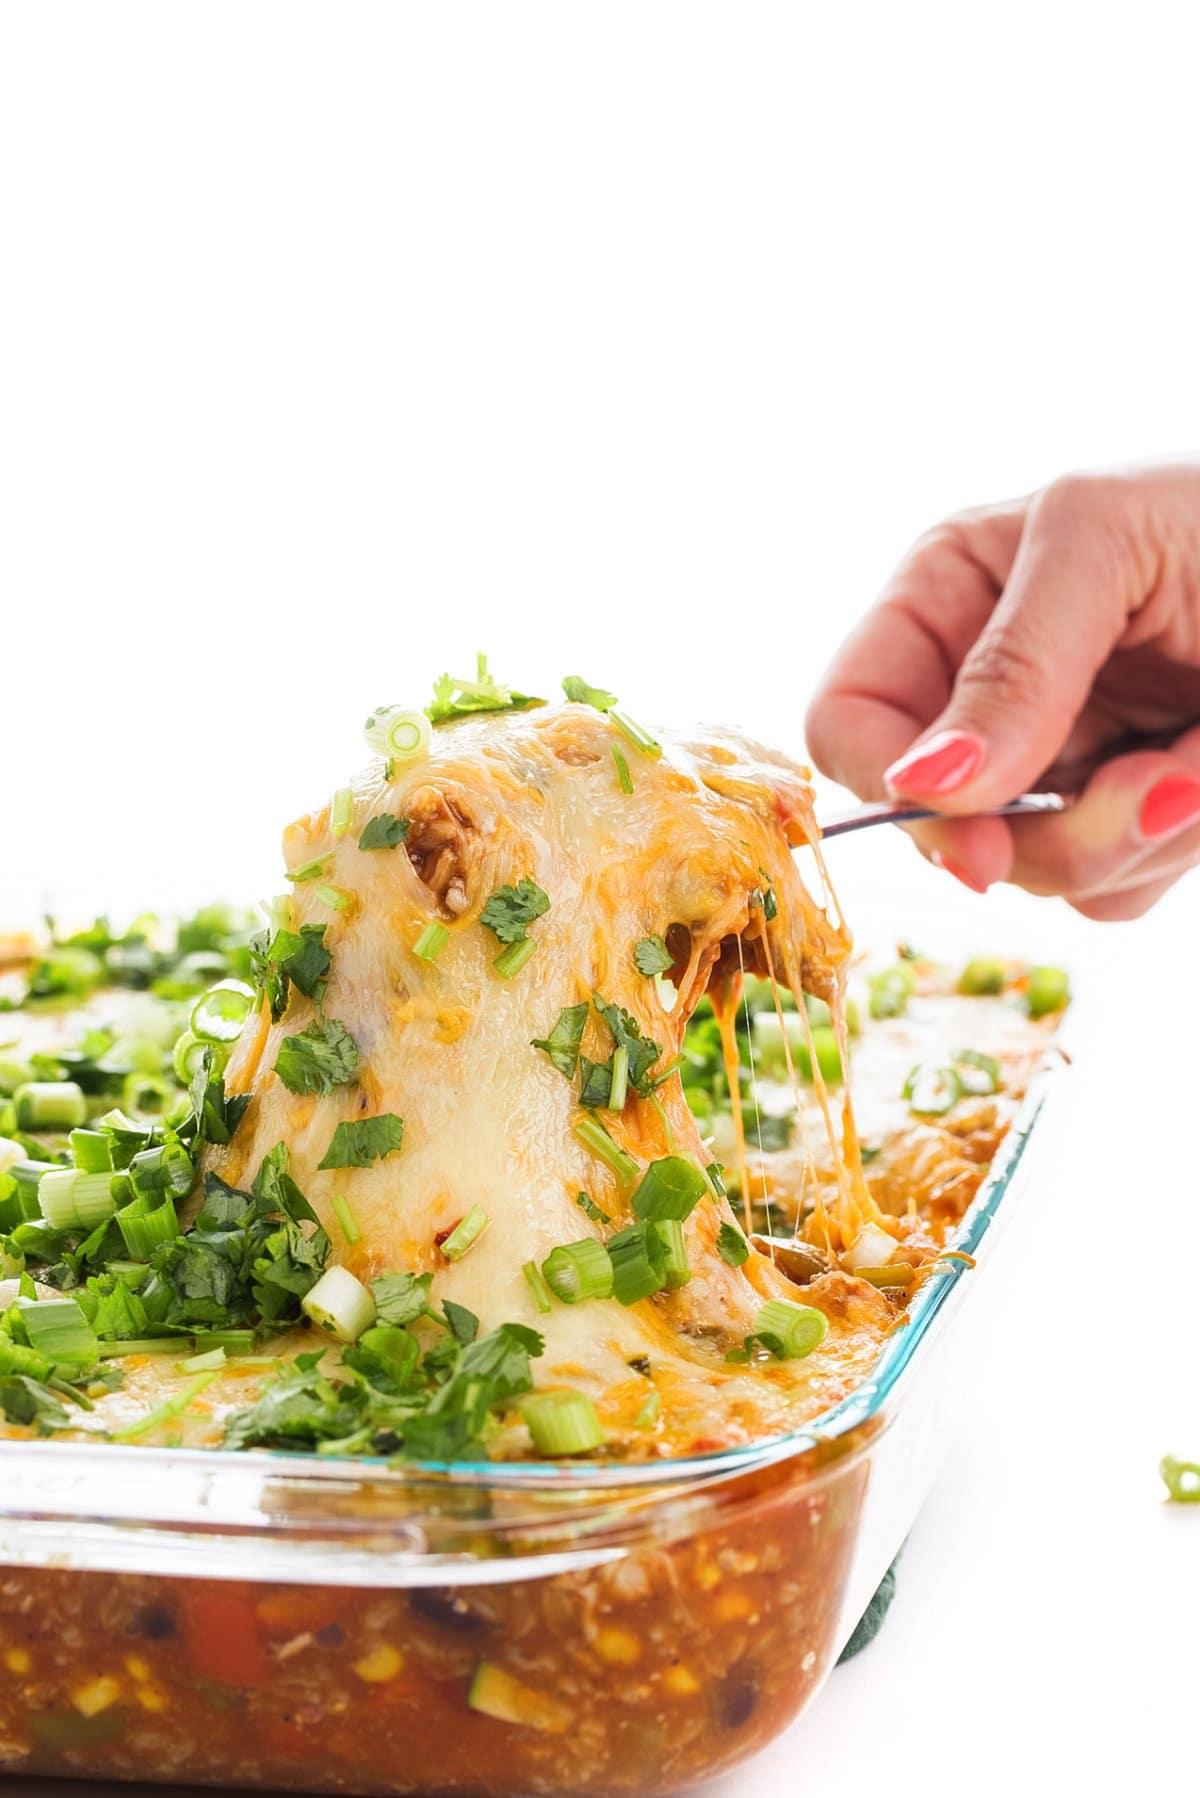 Liz scooping a cheesy bite of chicken enchilada farro bake